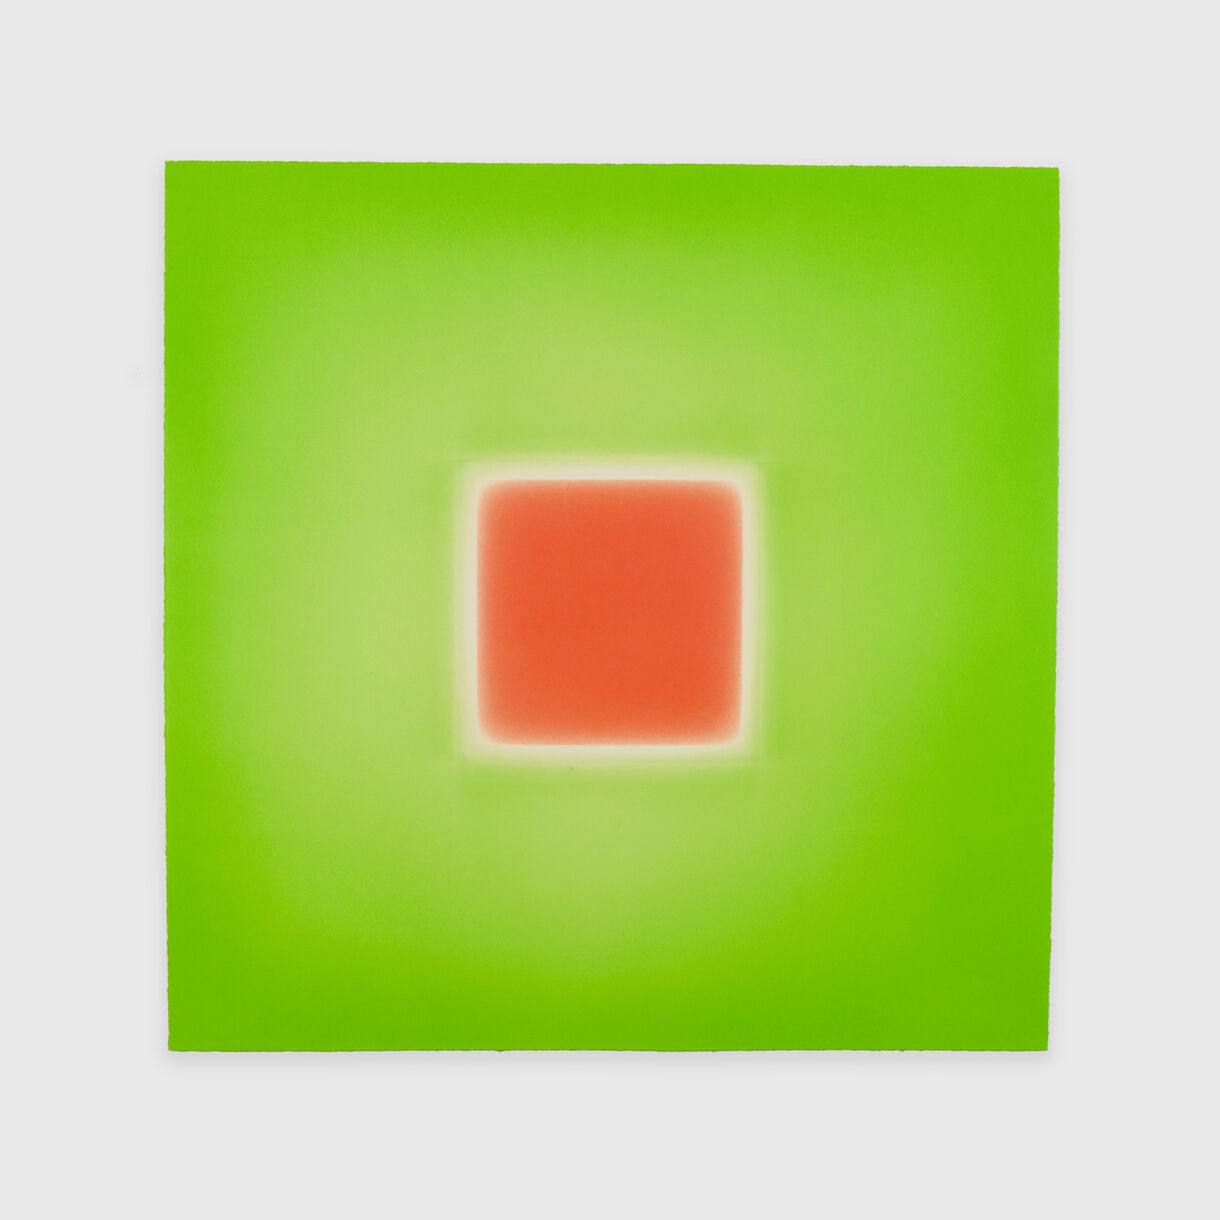 Grapefruit, Brian Eno